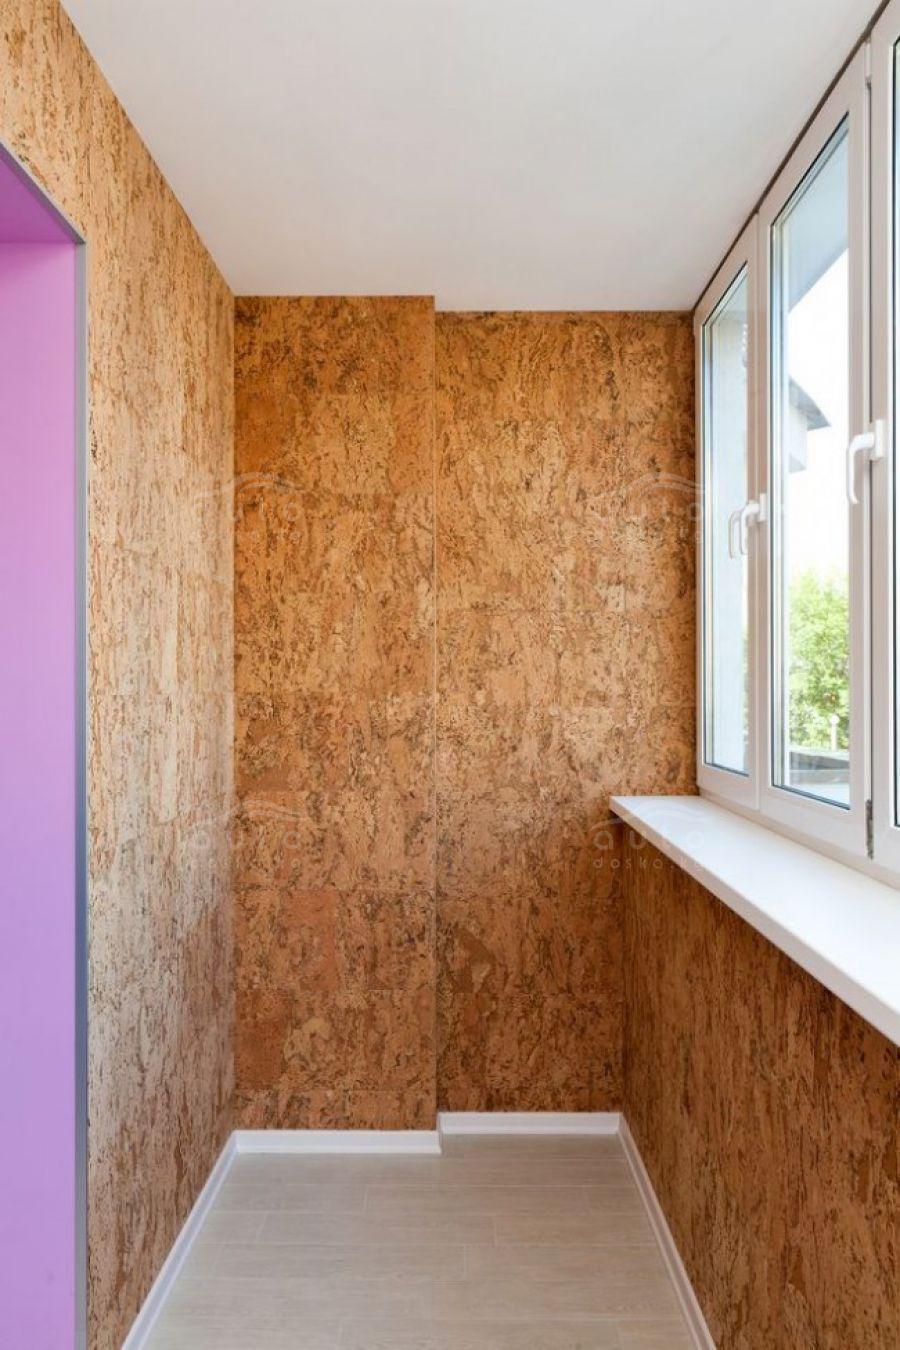 8 вариантов декоративной отделки балкона с фото - develop-st.